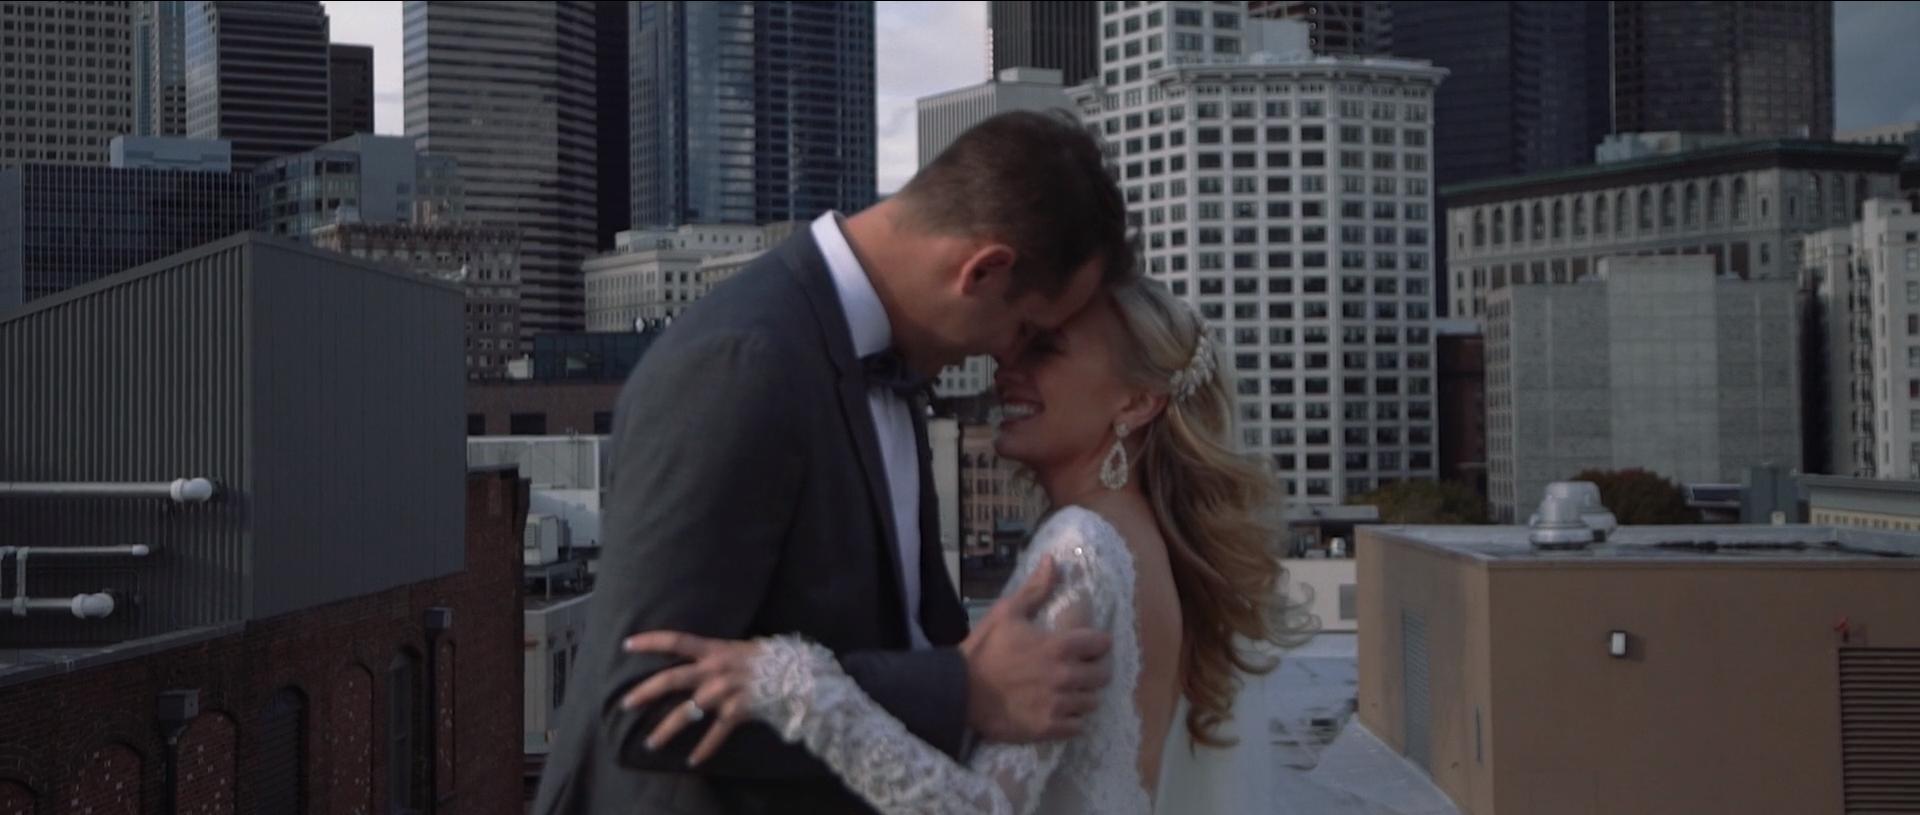 Classy Downtown Seattle Wedding    Shailee + Kramer    VIEW WEDDING